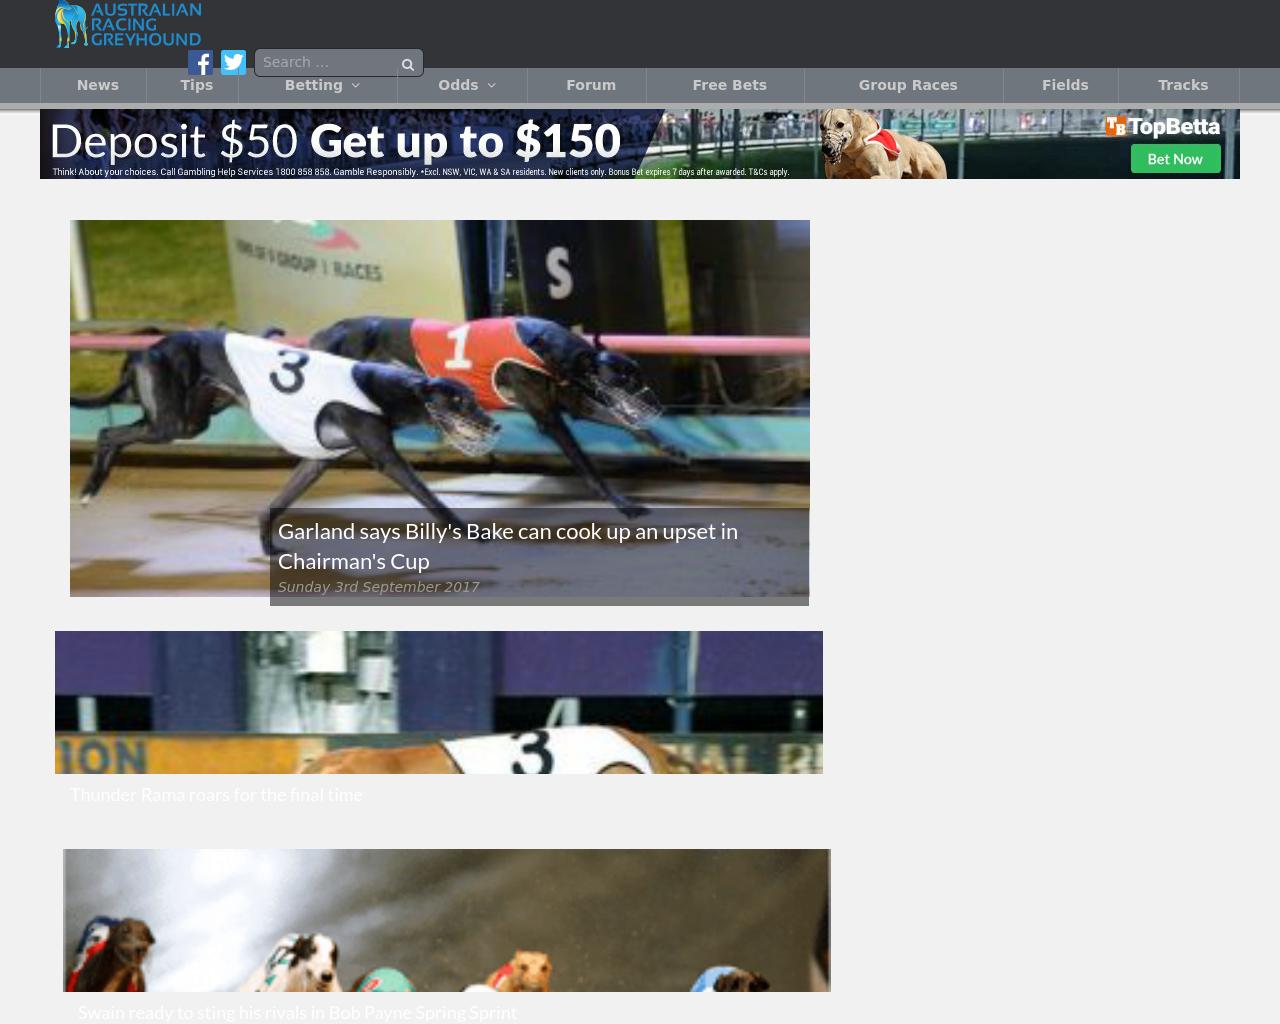 Australian-Racing-Greyhound-Advertising-Reviews-Pricing